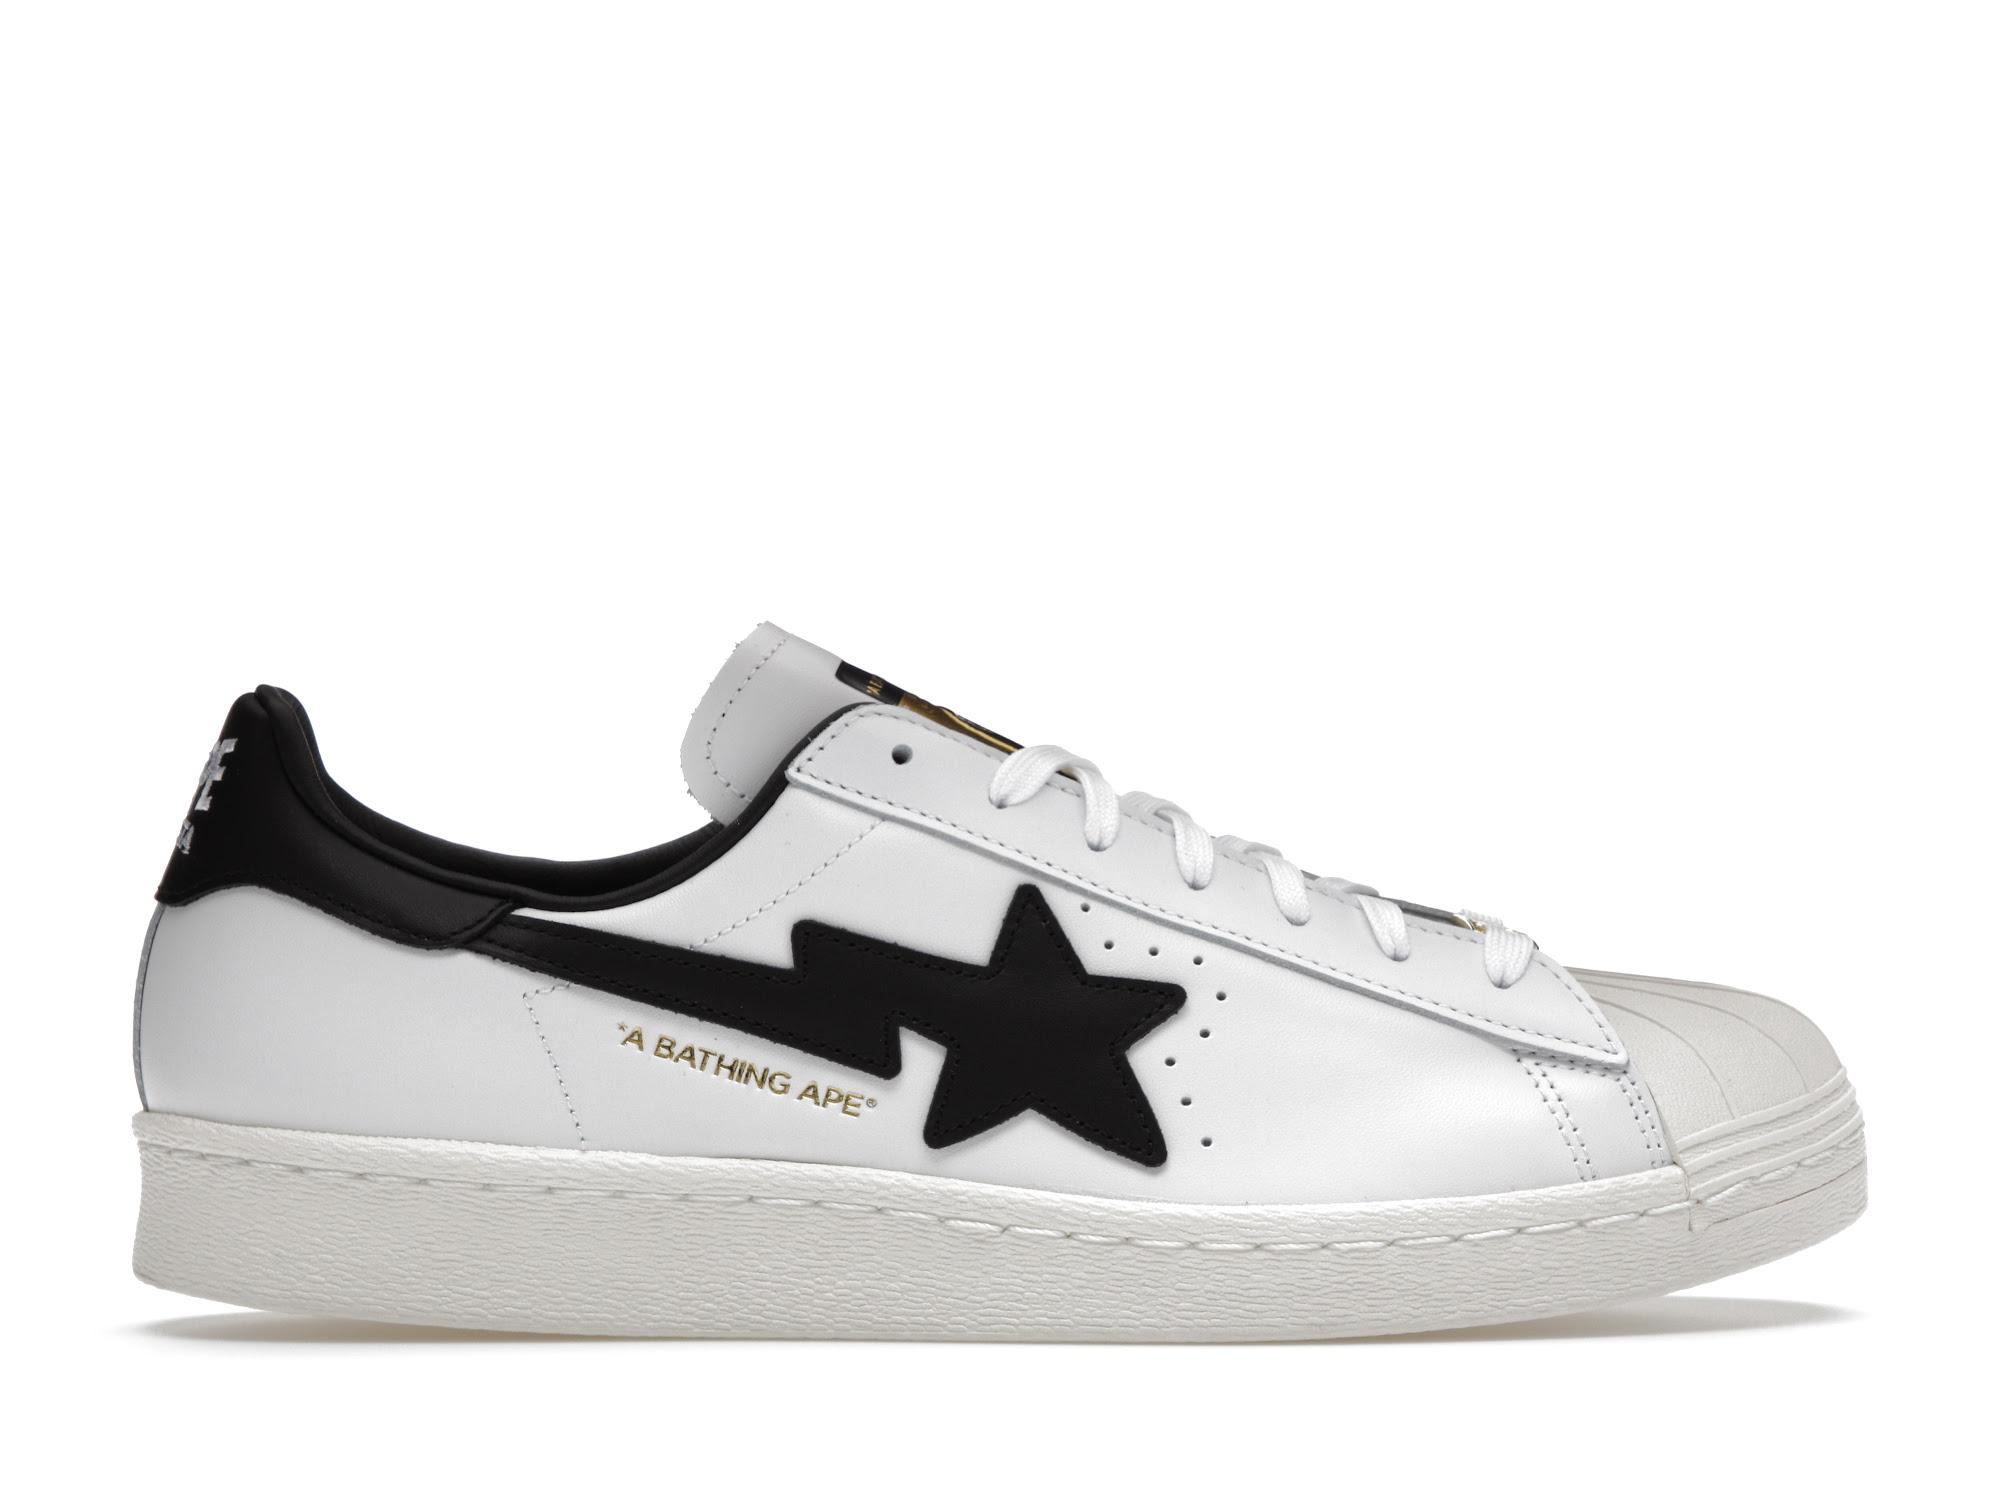 adidas Superstar 80s Bape White Black